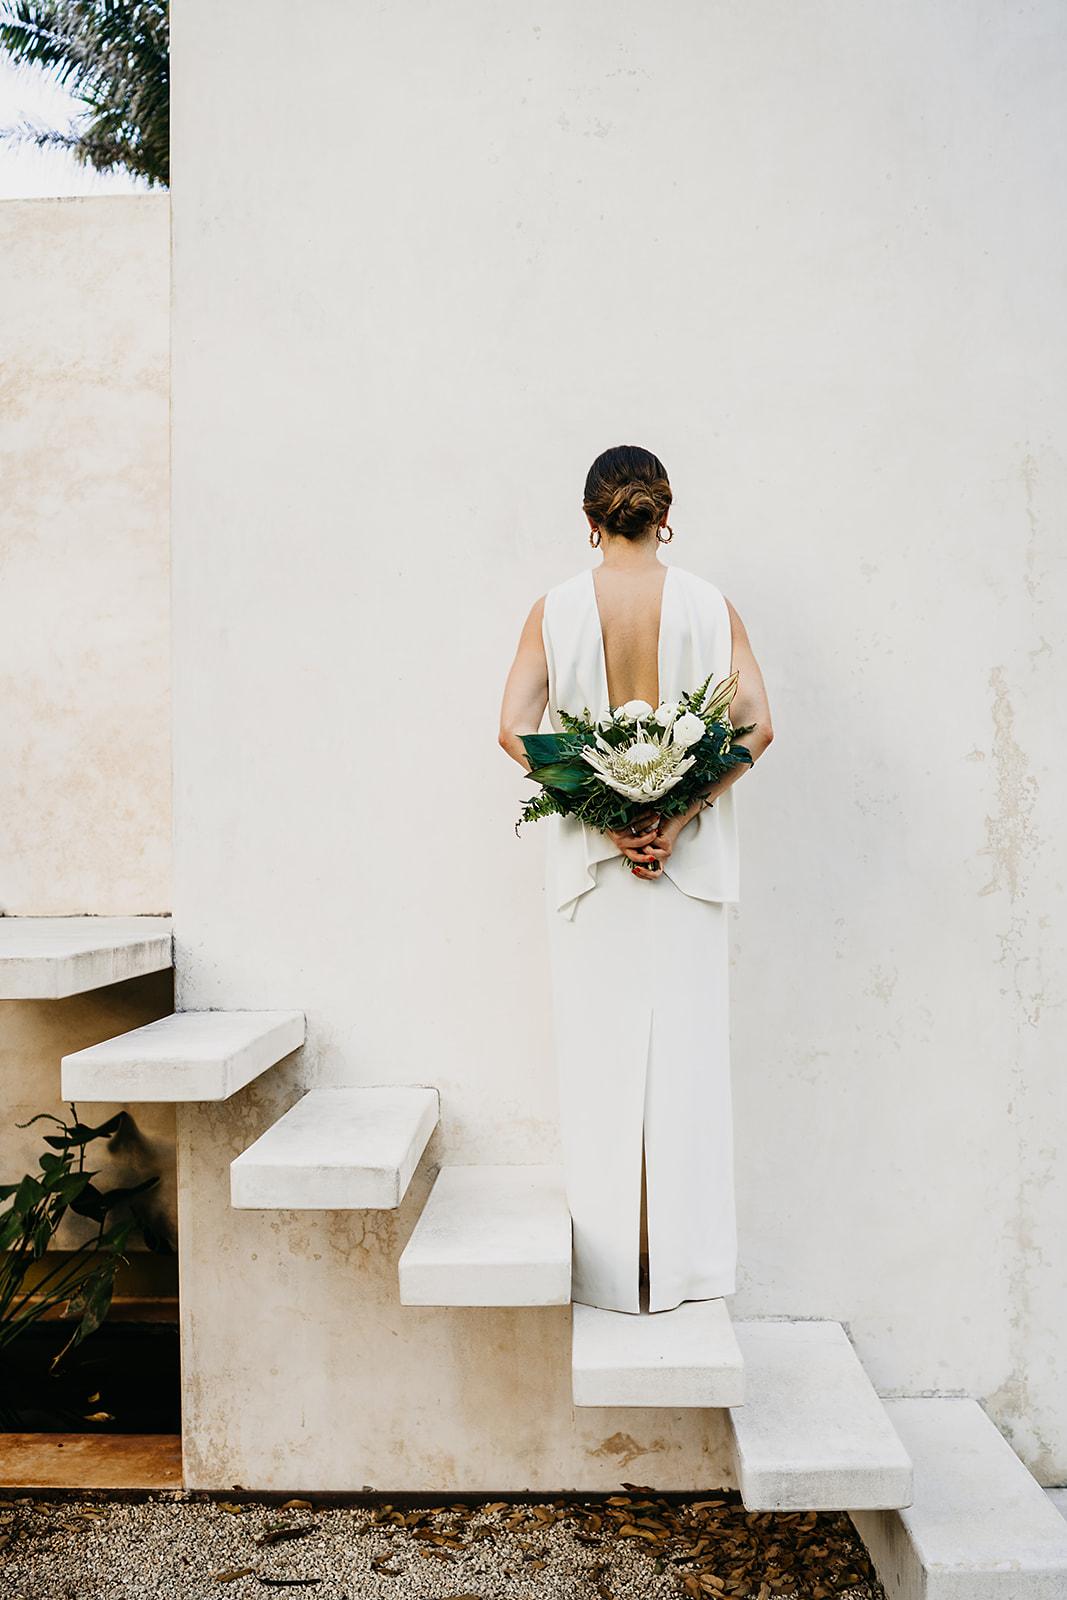 AmandaMarkus-Hacienda-Sac-Chich-Merida-Wedding-391.jpg